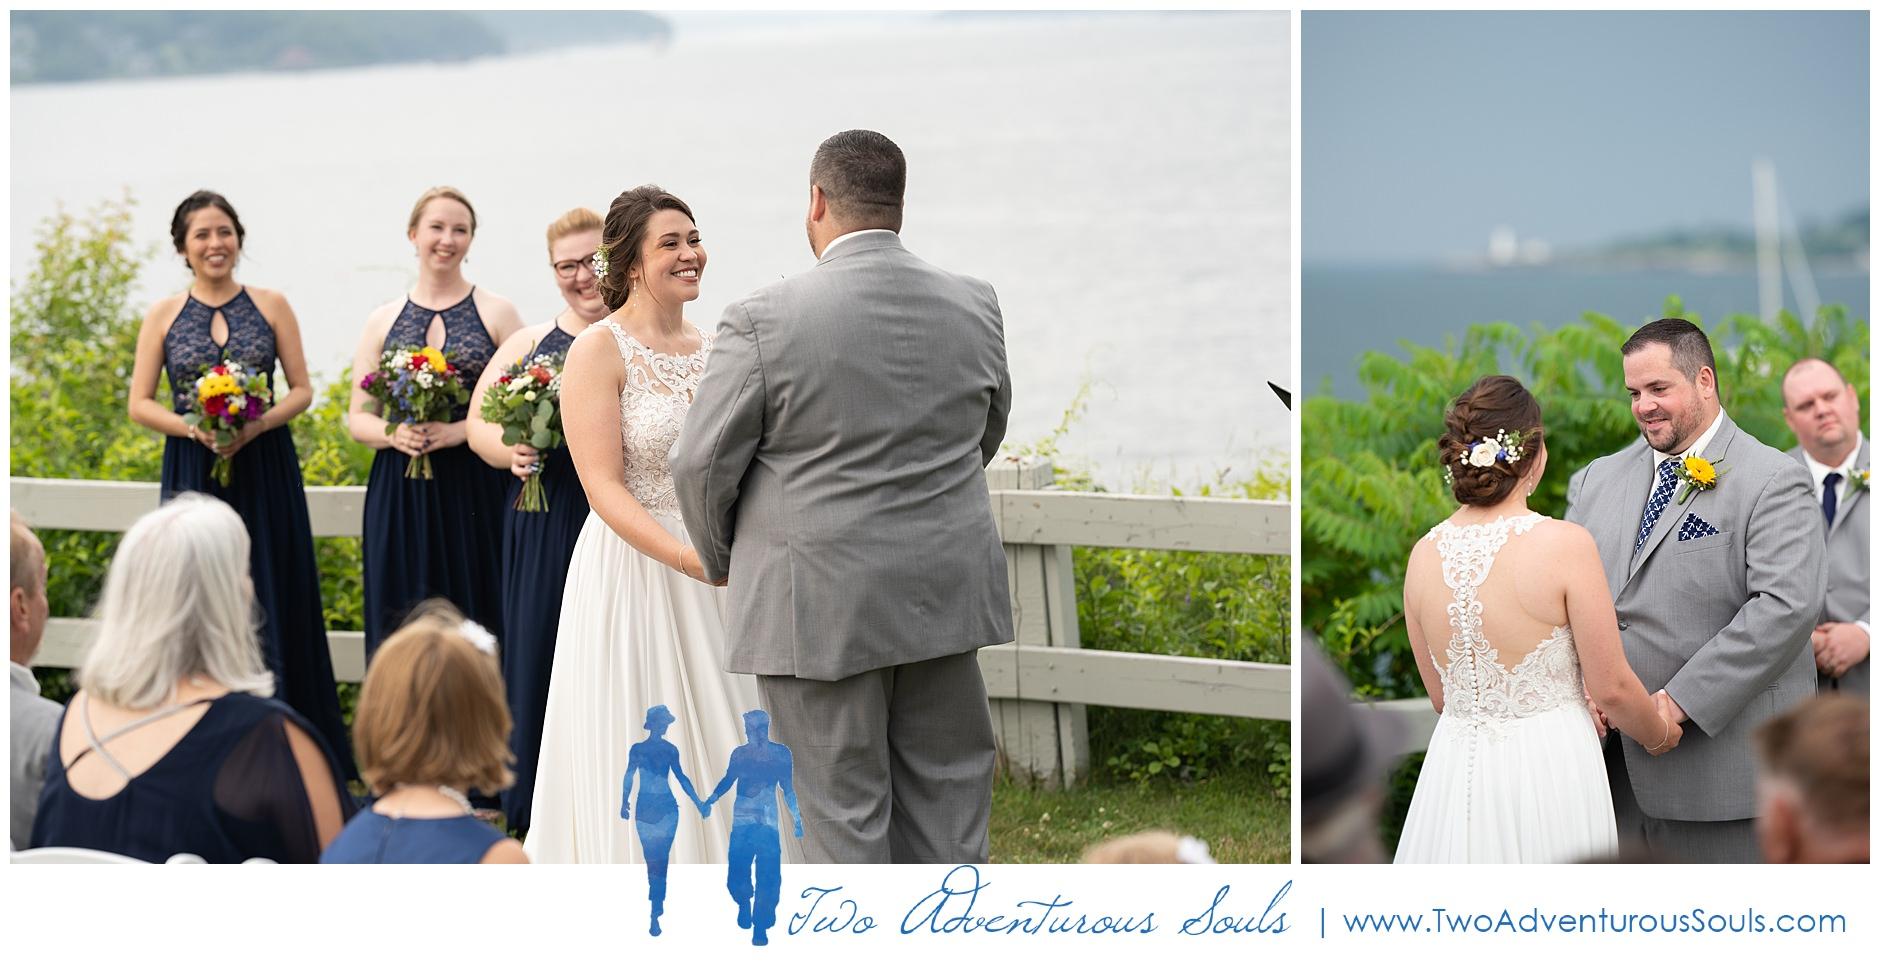 Maine Wedding Photographers, SMCC Wedding Photographers, Southern Maine Community College Wedding Photographers, Two Adventurous Souls-AshleyAaron_0028.jpg